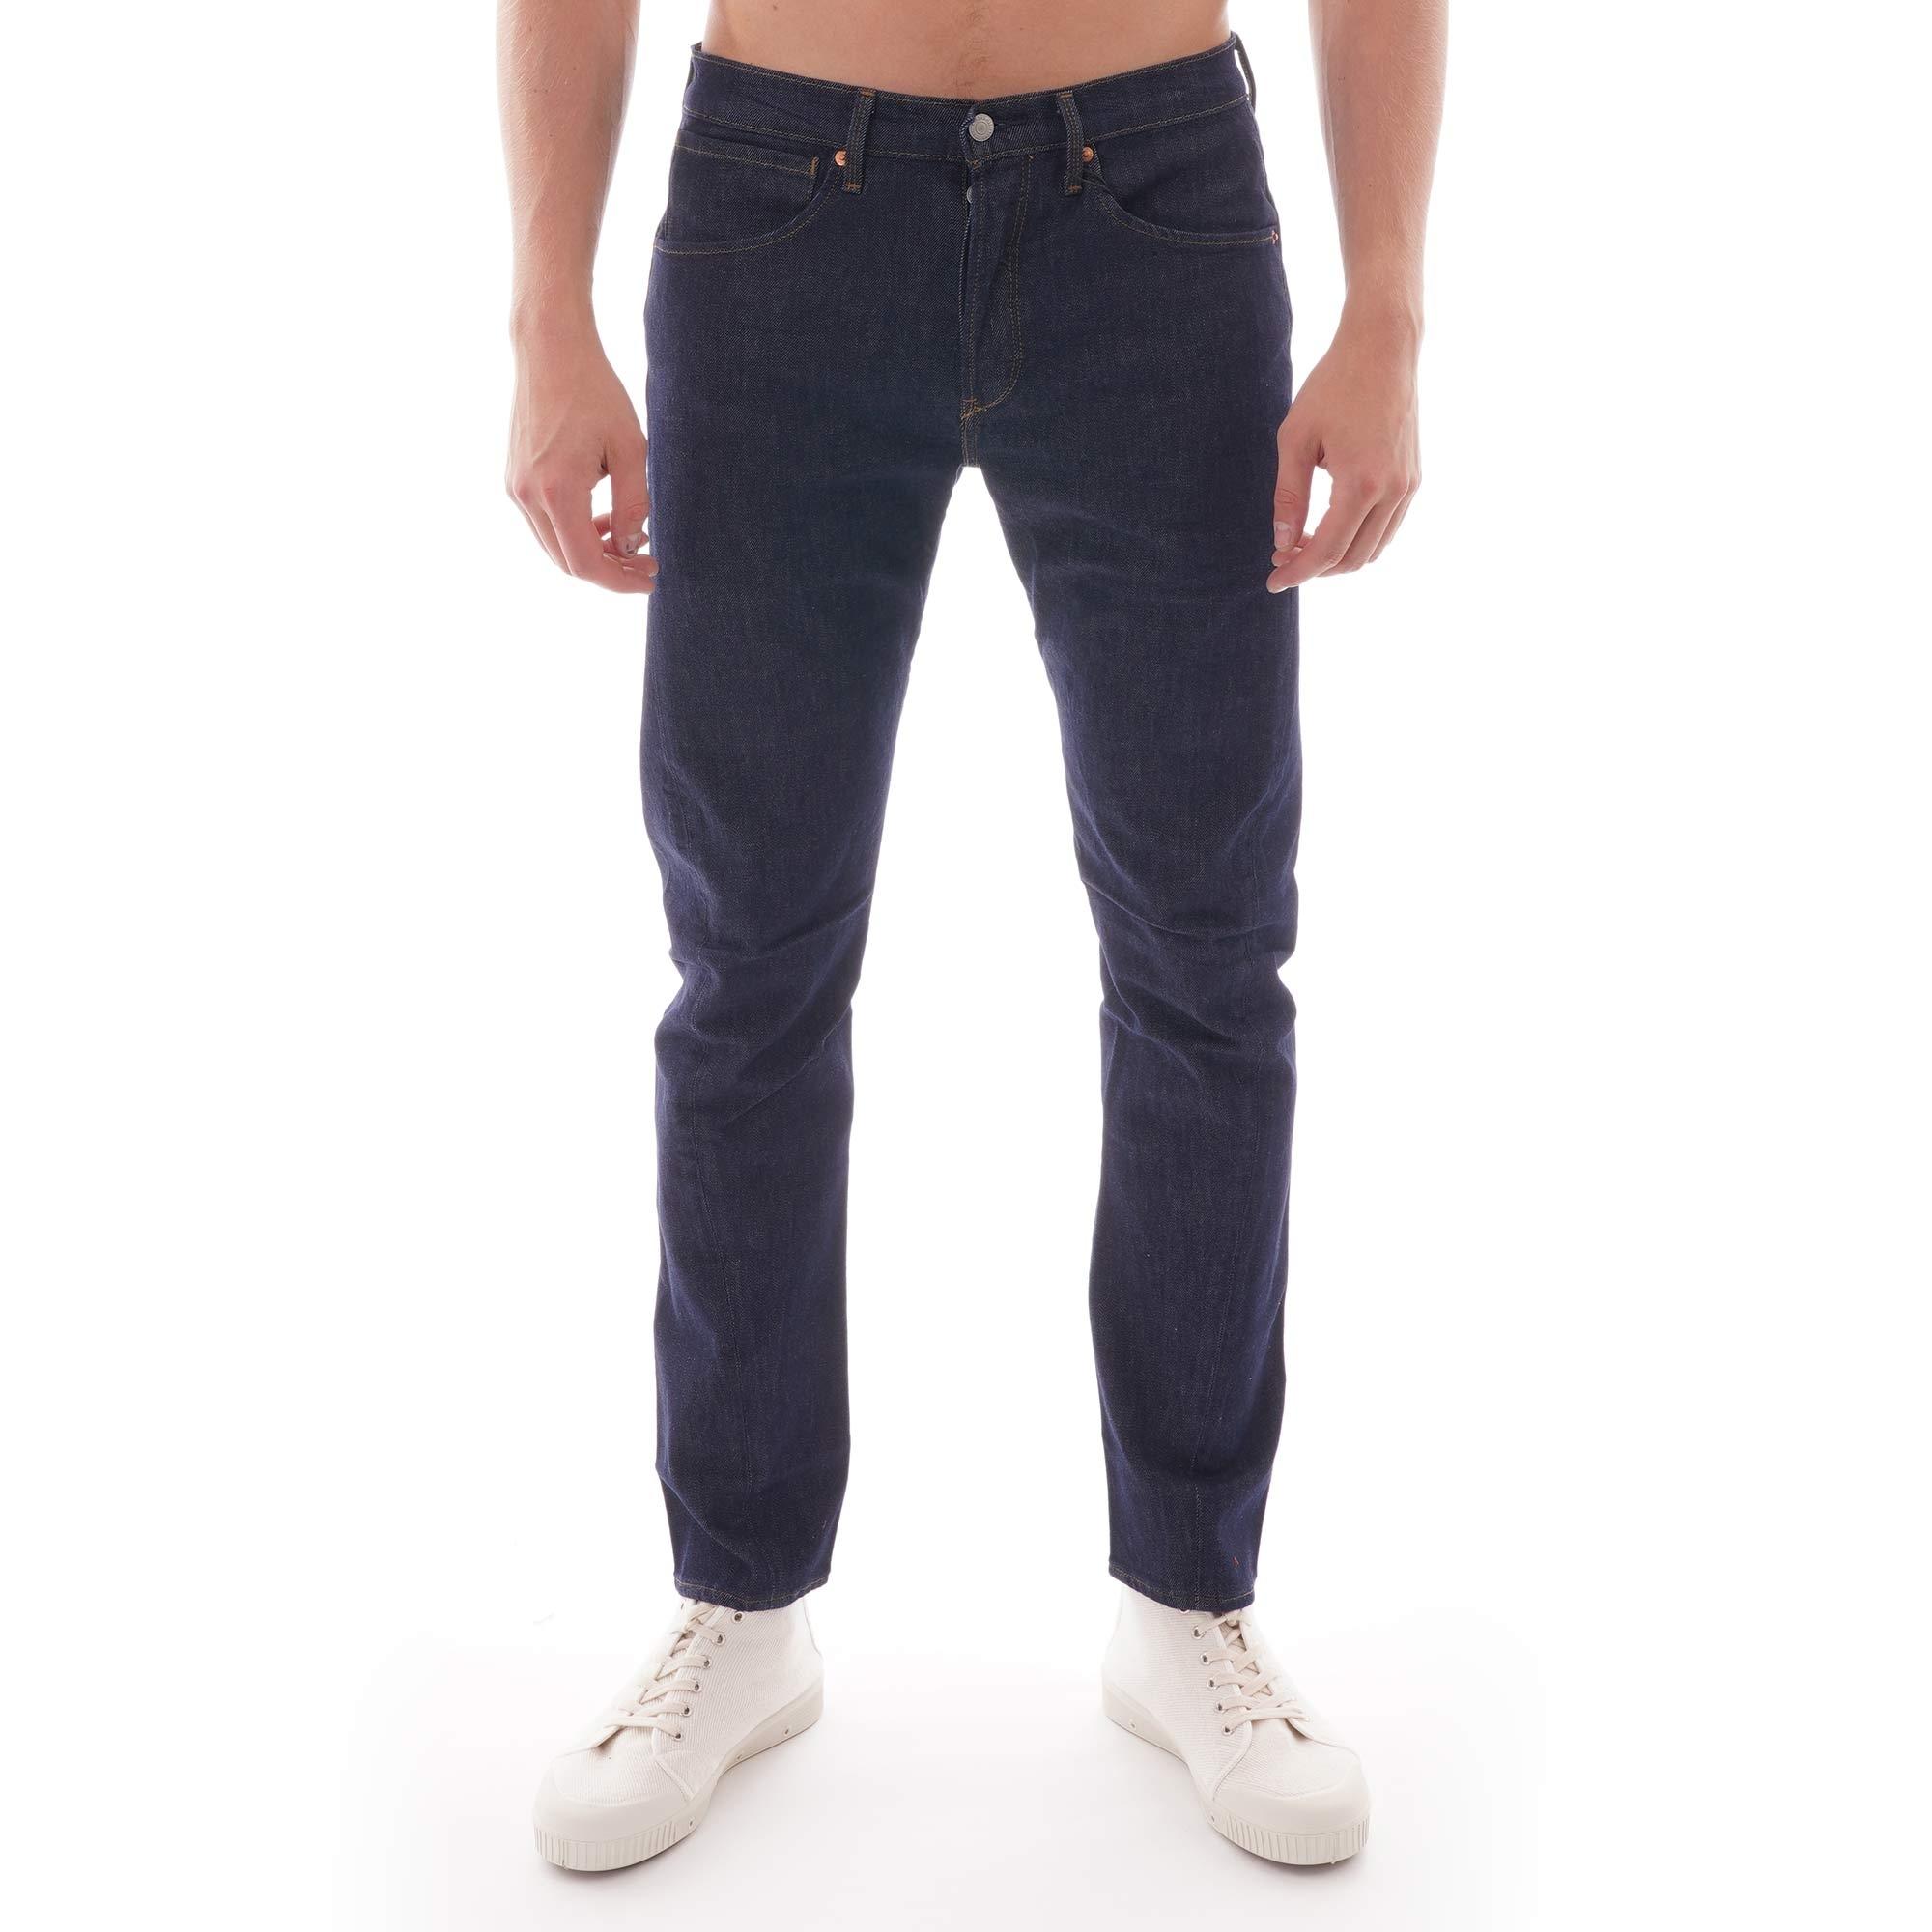 Fabulous Levi's Tapered Fit Jeans LEJ 502 | Rinsed Denim | 72775-0000 NQ62